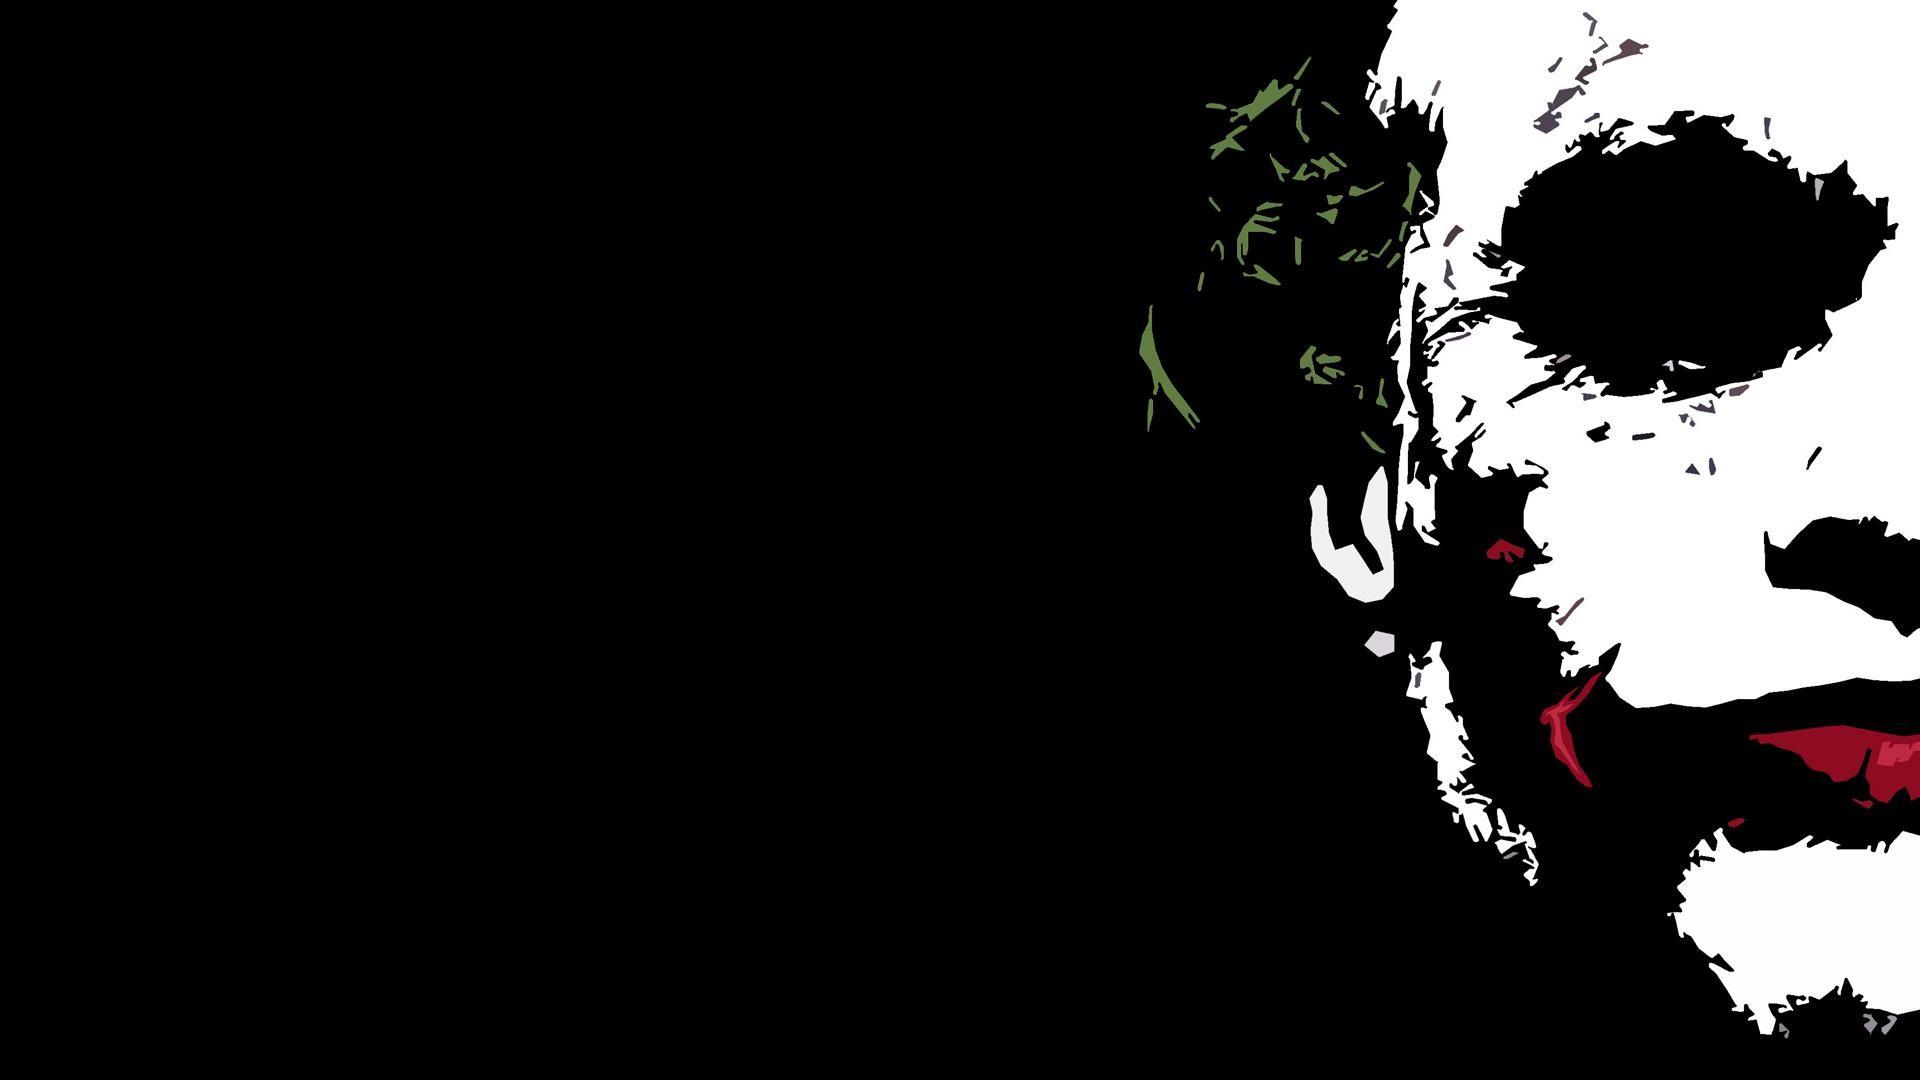 Batman The Joker Heath Ledger wallpaper background 1920x1080